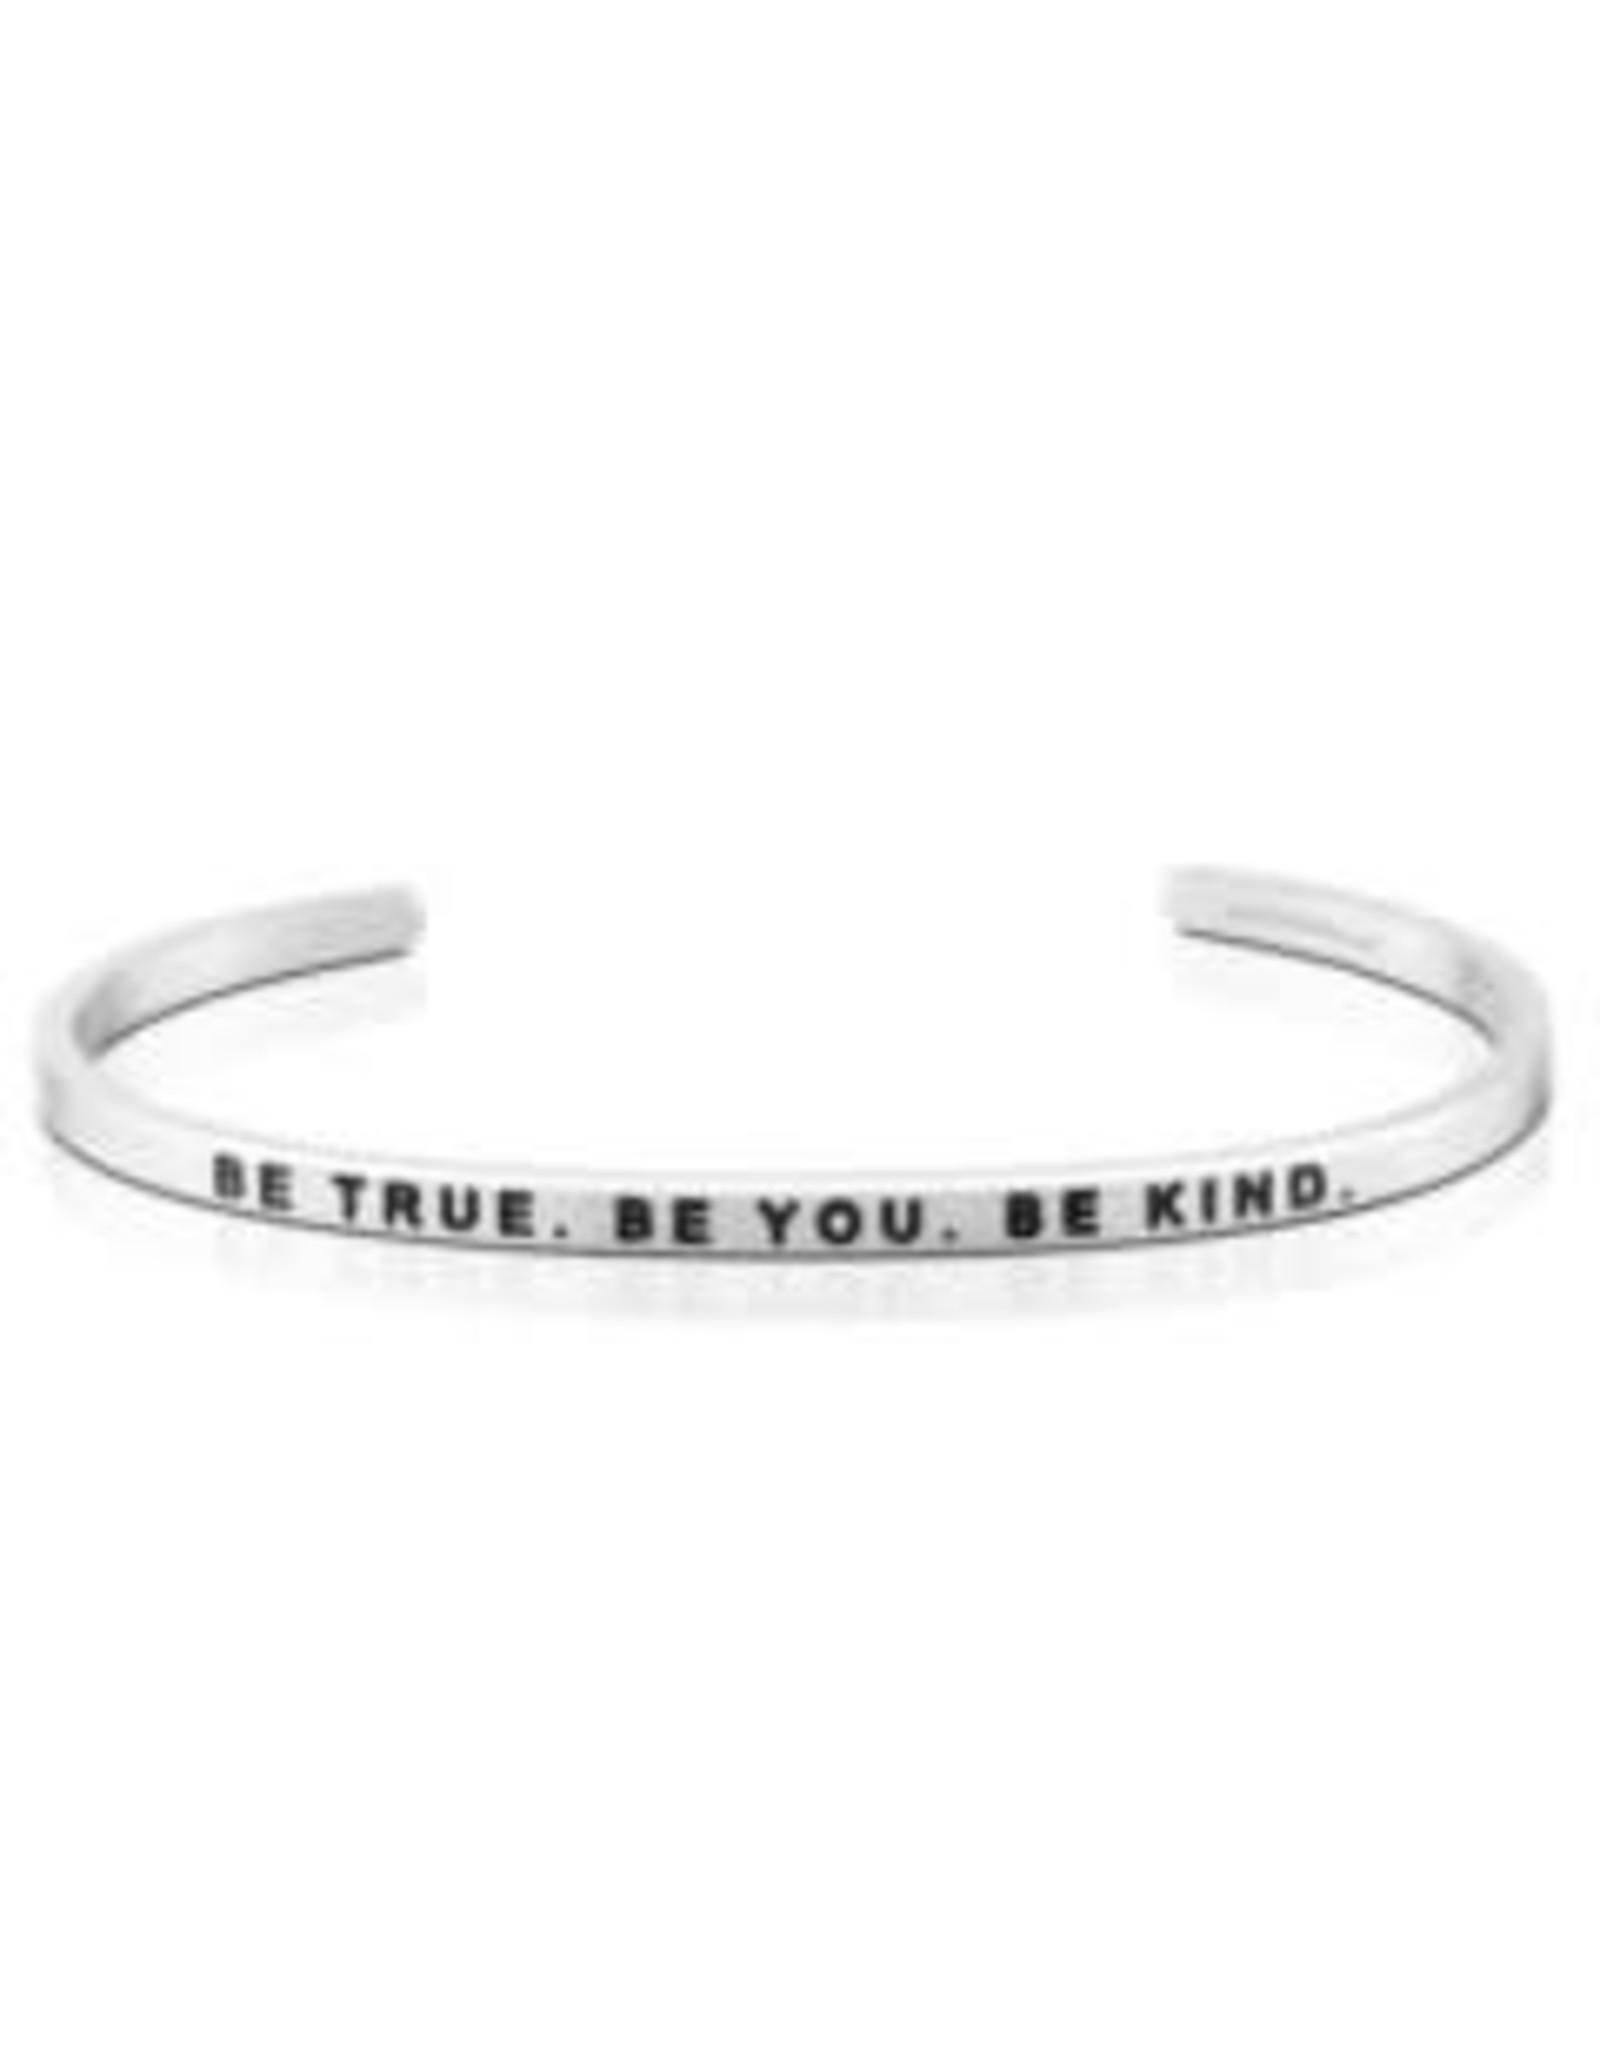 MantraBand MantraBand Bracelet, Be True Be You Be Kind